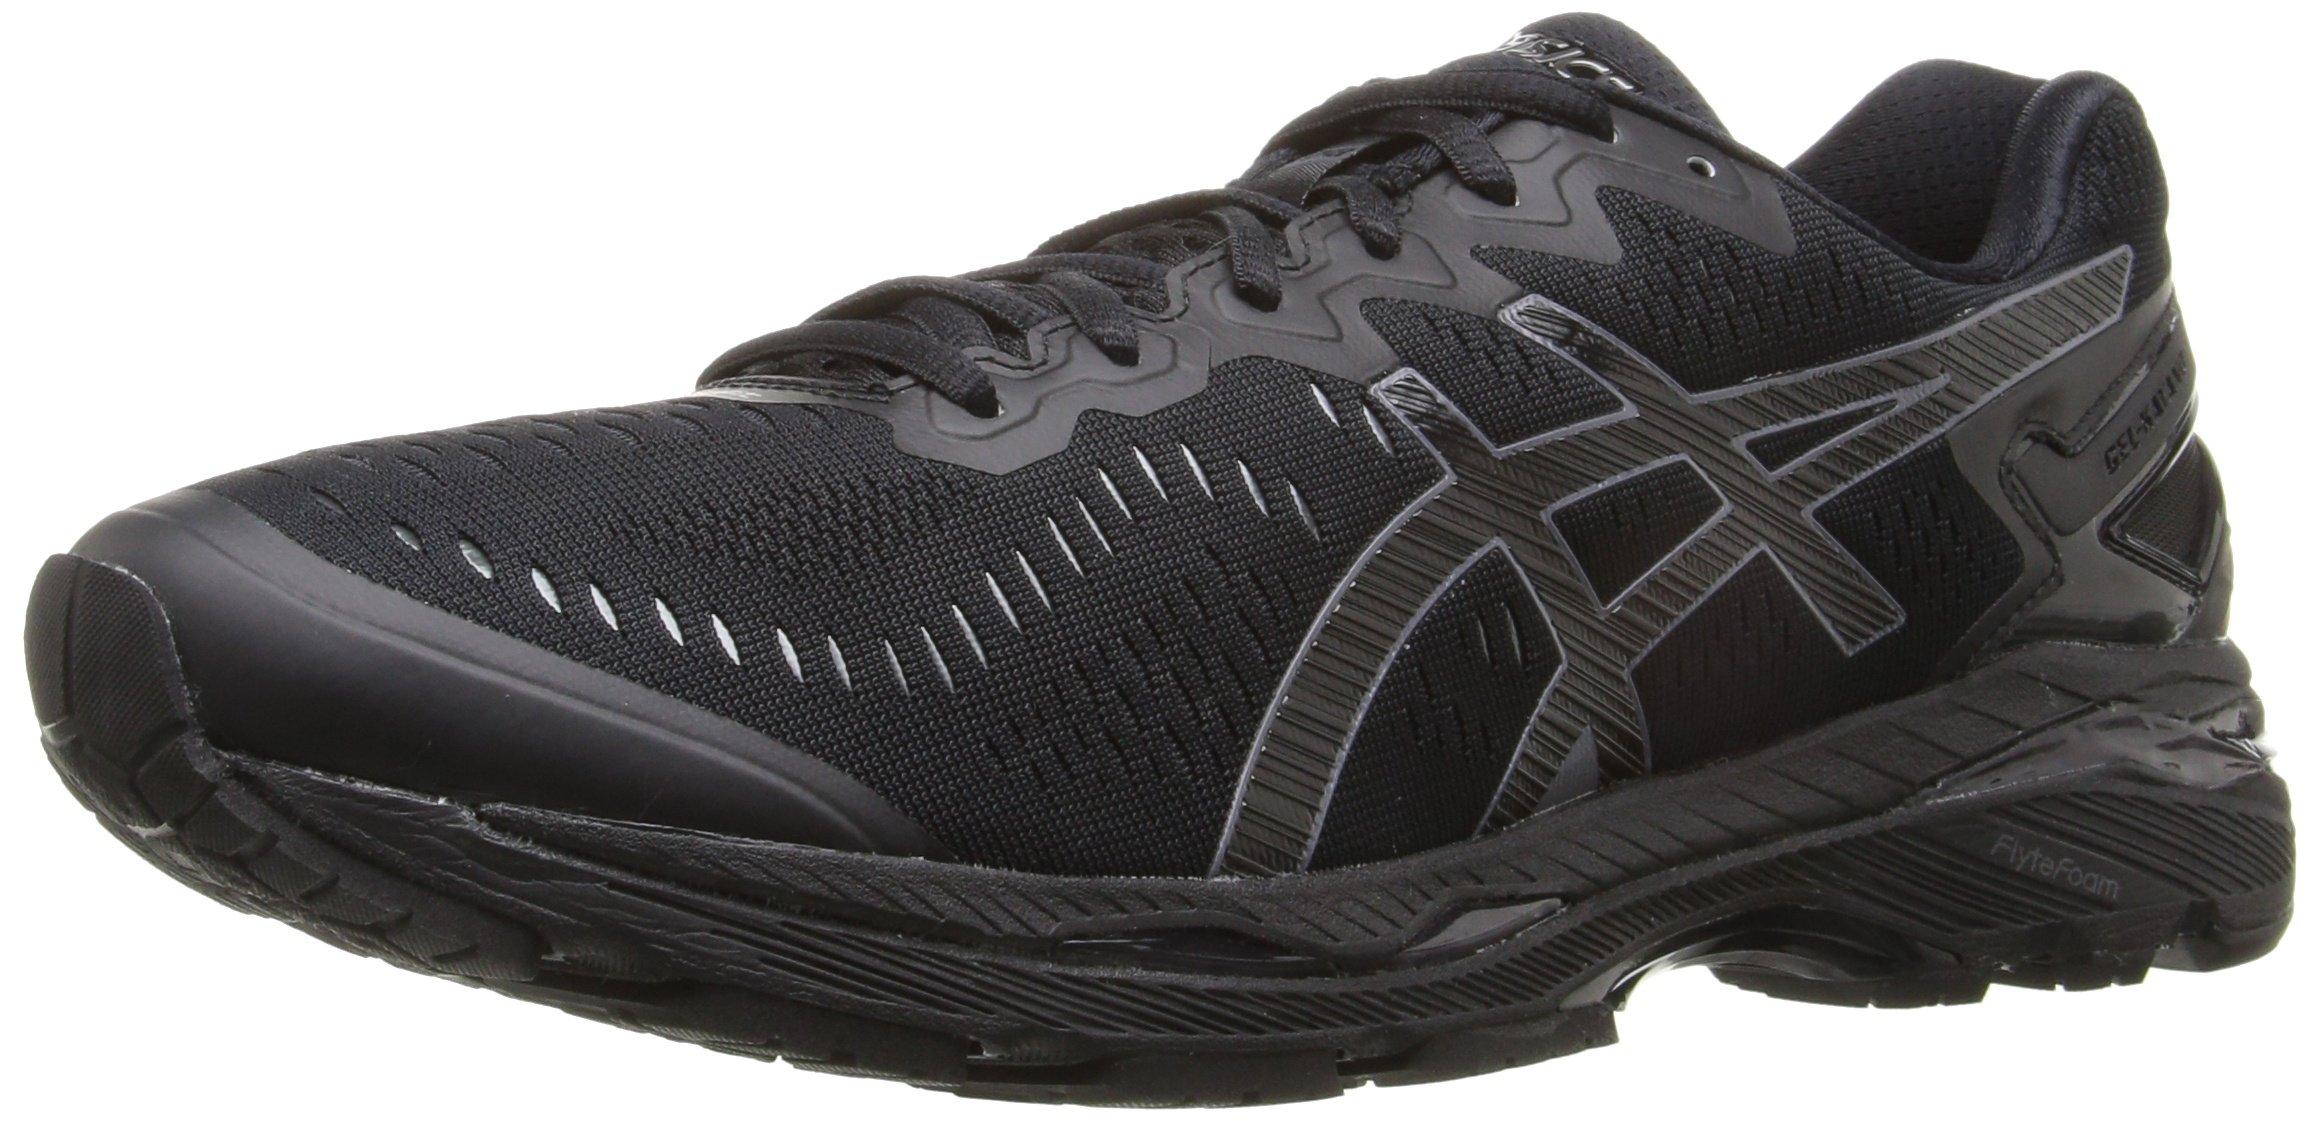 0535d348be1e ASICS Men s Gel-Kayano 23 Running Shoe Black Onyx Carbon 9.5 D(M) US ...